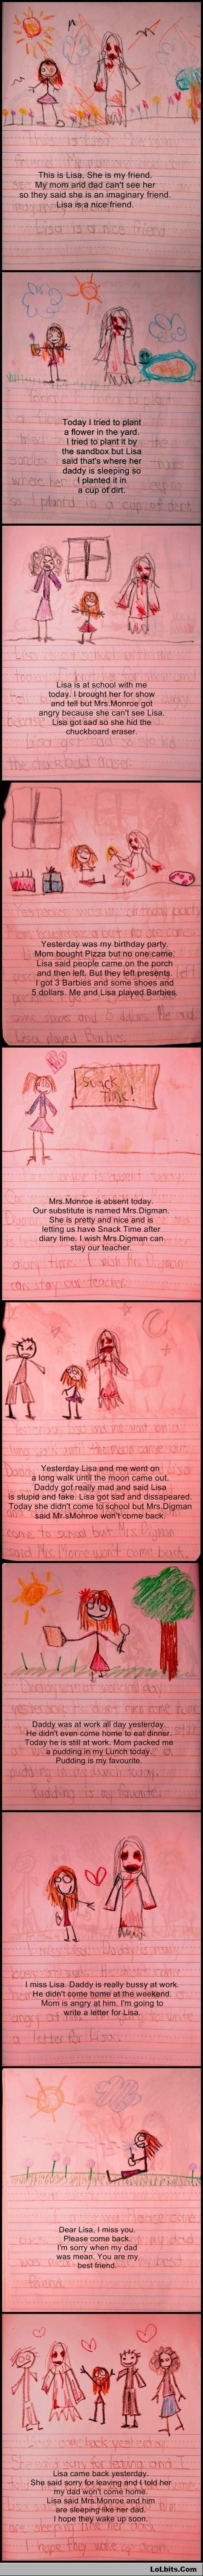 Creepiest. Diary. EVER